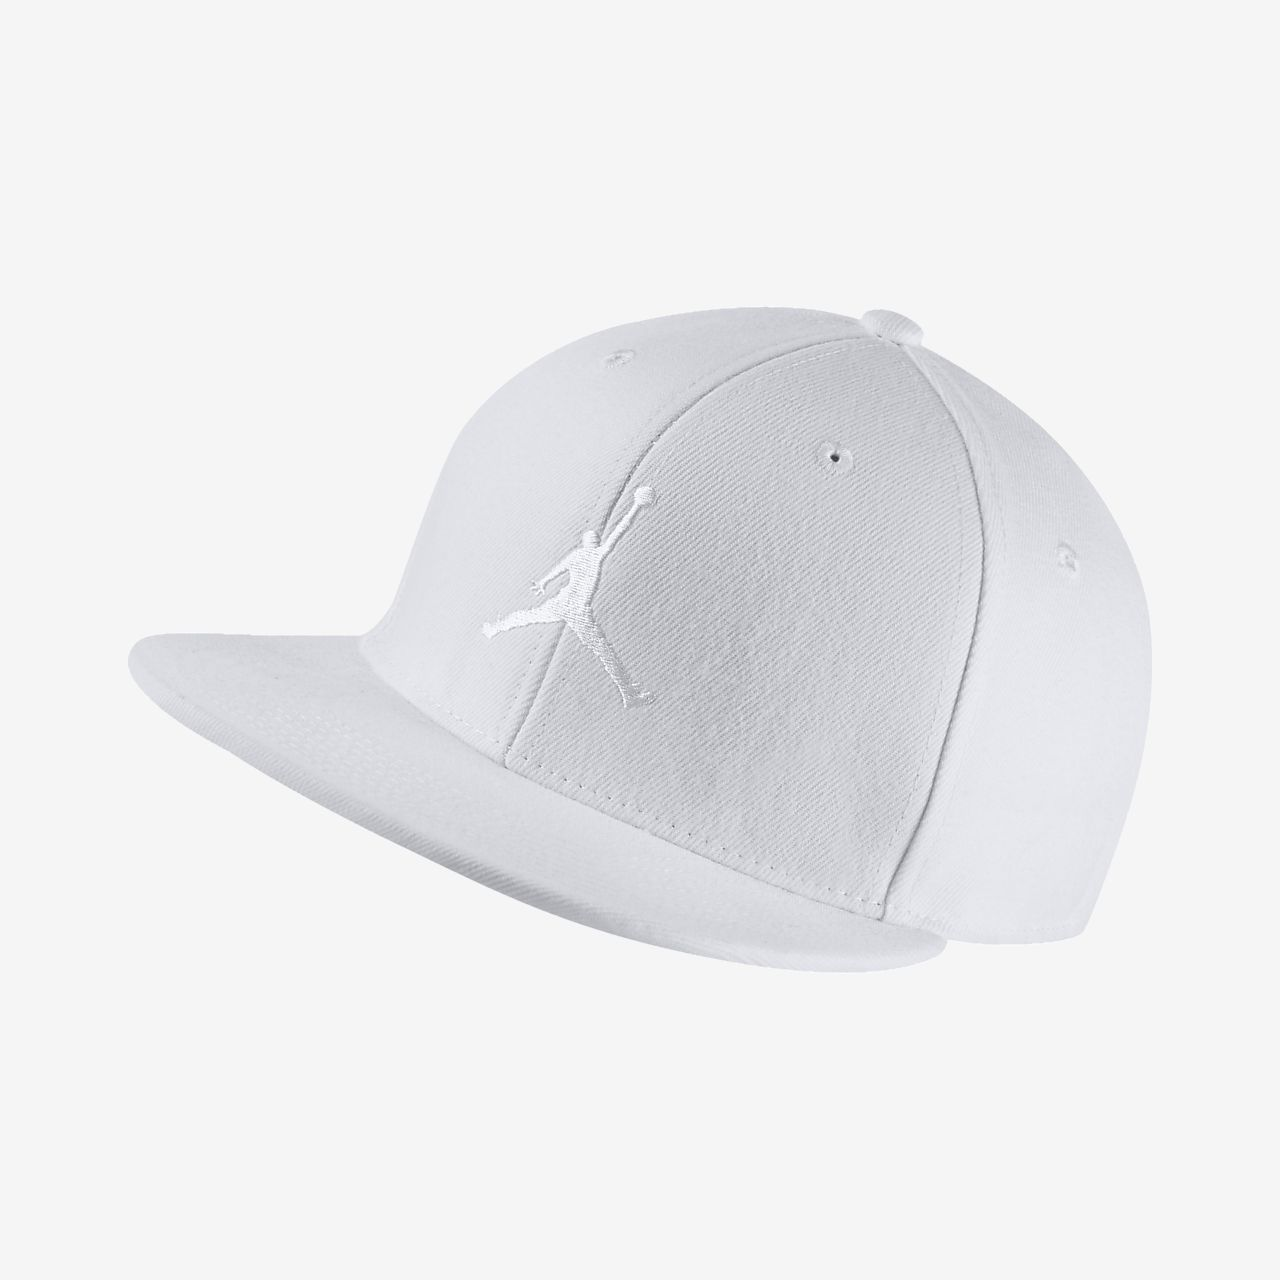 fccbd463 ... best price jordan jumpman kids adjustable hat 0119d 7386a